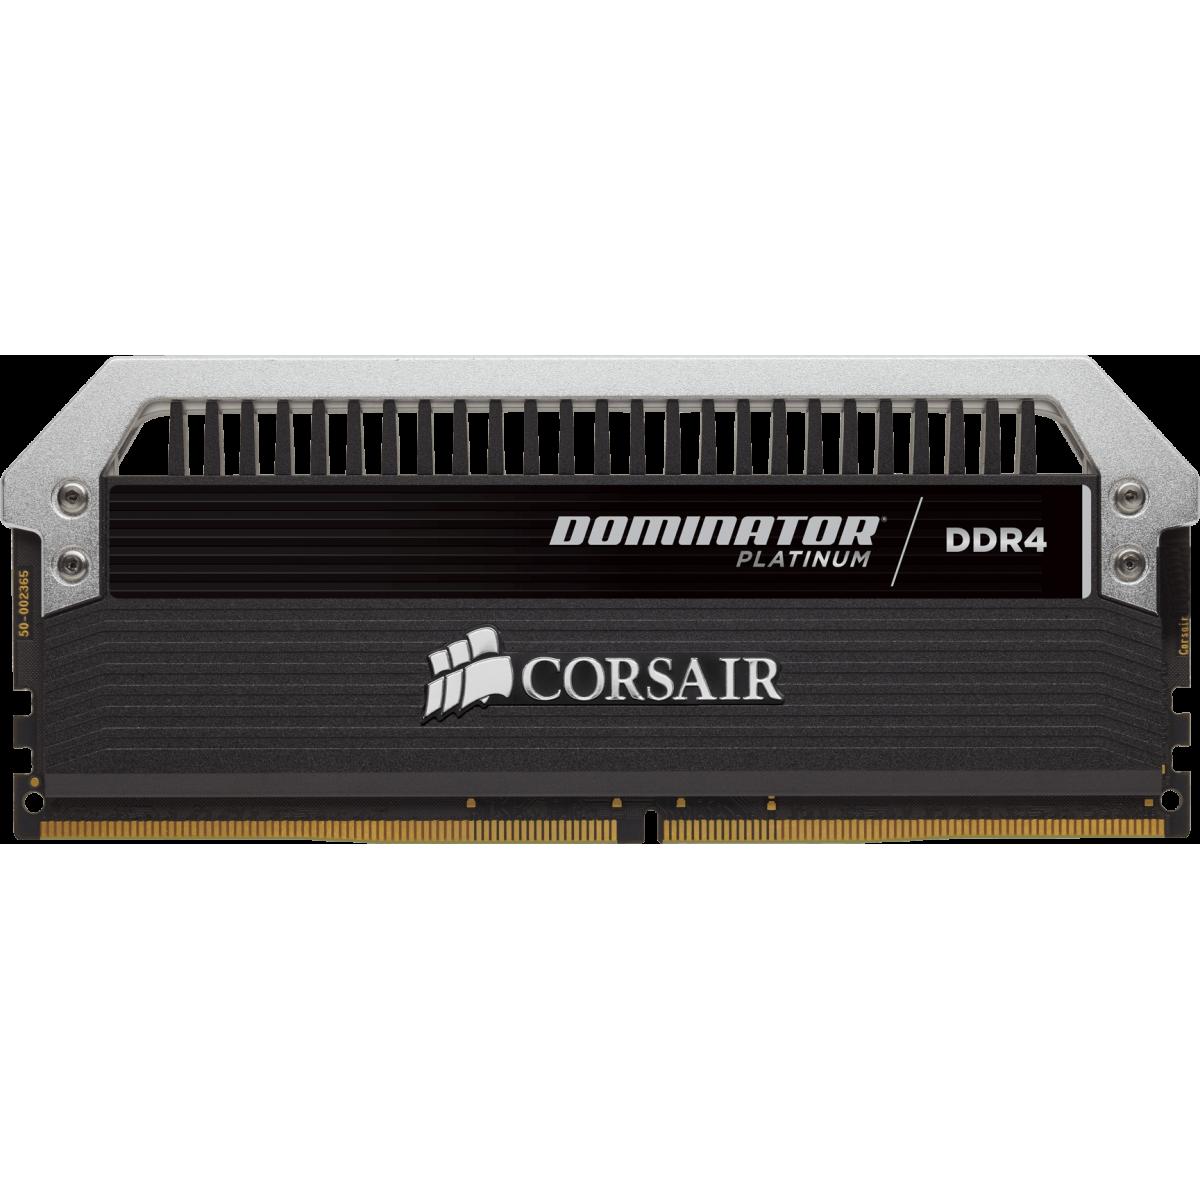 Memória DDR4 Corsair Dominator Platinum, 16GB (2X8GB) 3000MHZ, CMD16GX4M2B3000C15